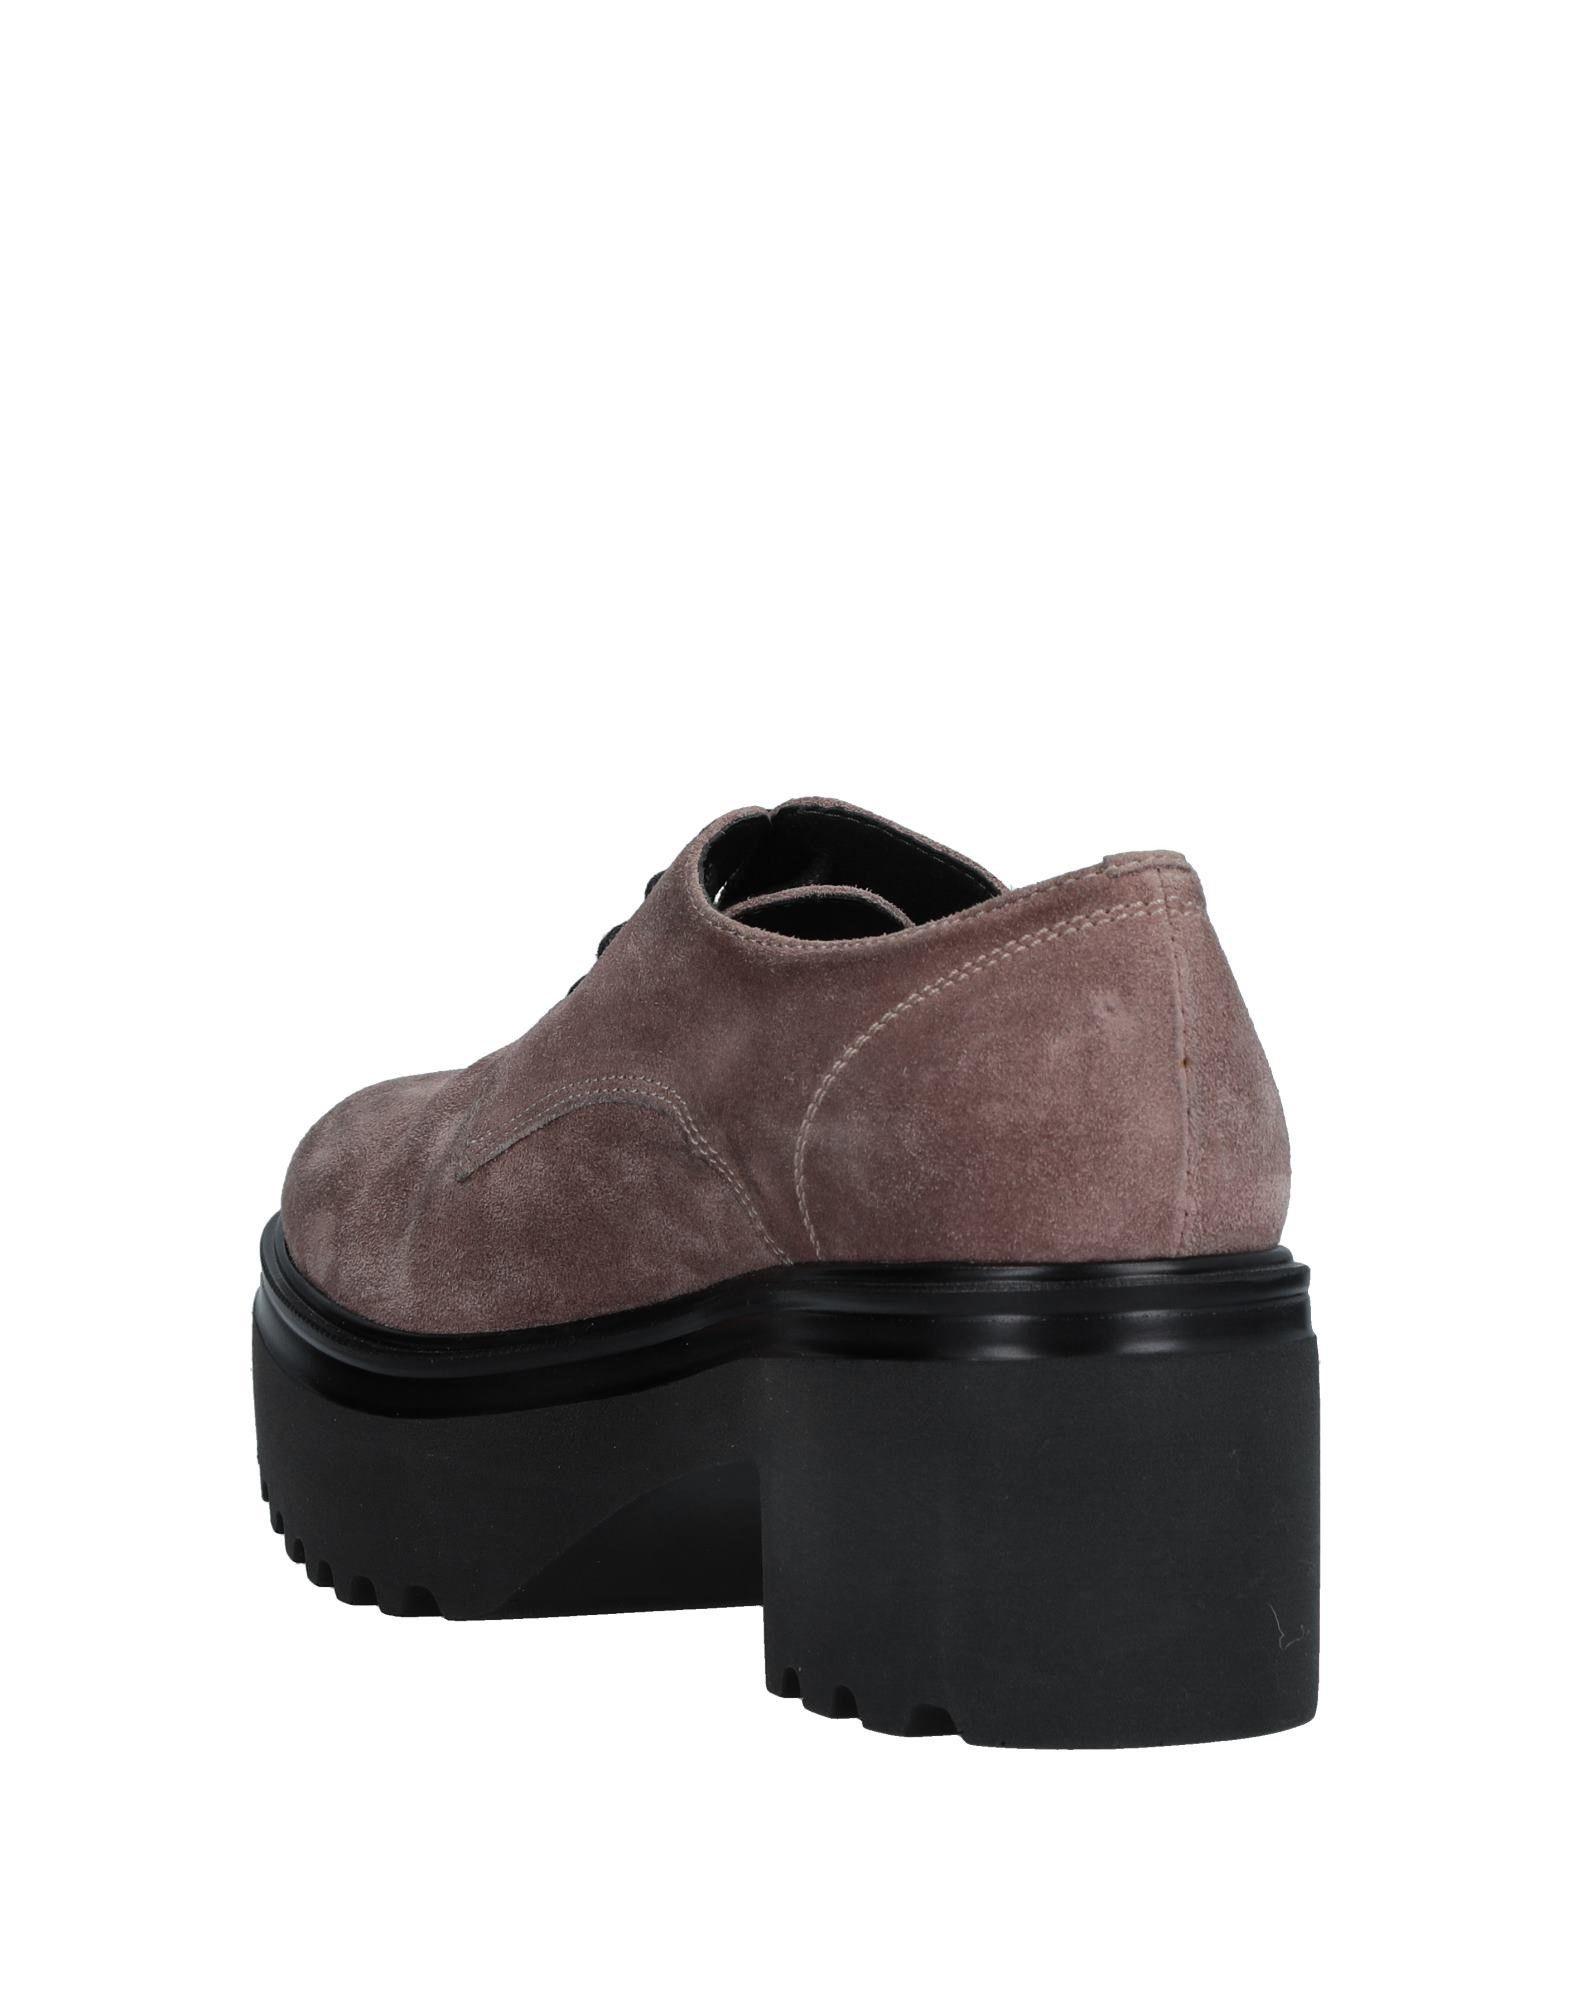 Janet Qualität Sport Schnürschuhe Damen  11527771QV Gute Qualität Janet beliebte Schuhe 2306c7